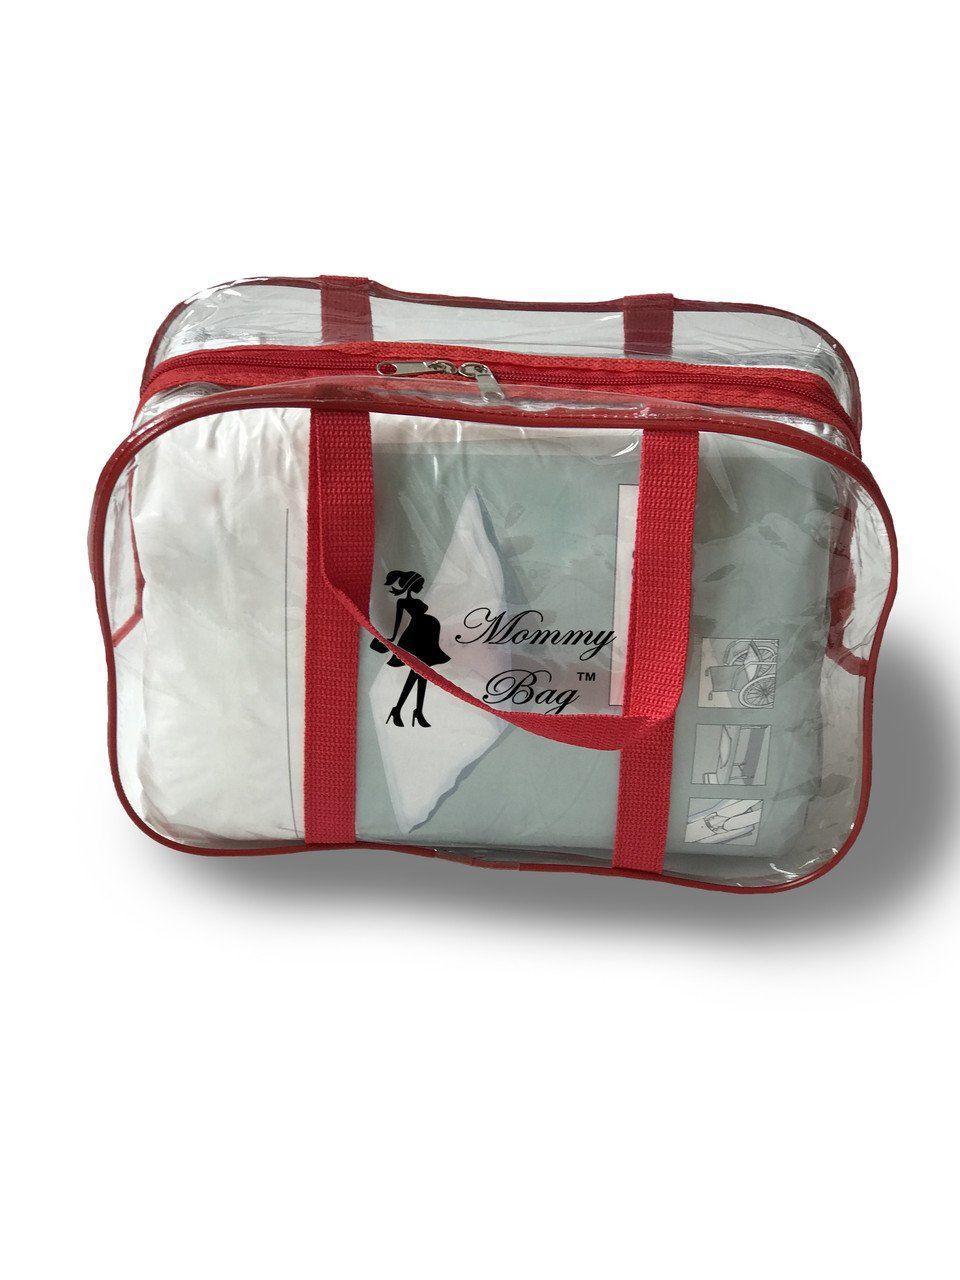 Сумка прозрачная в роддом Mommy Bag, размер - S, цвет - Красный